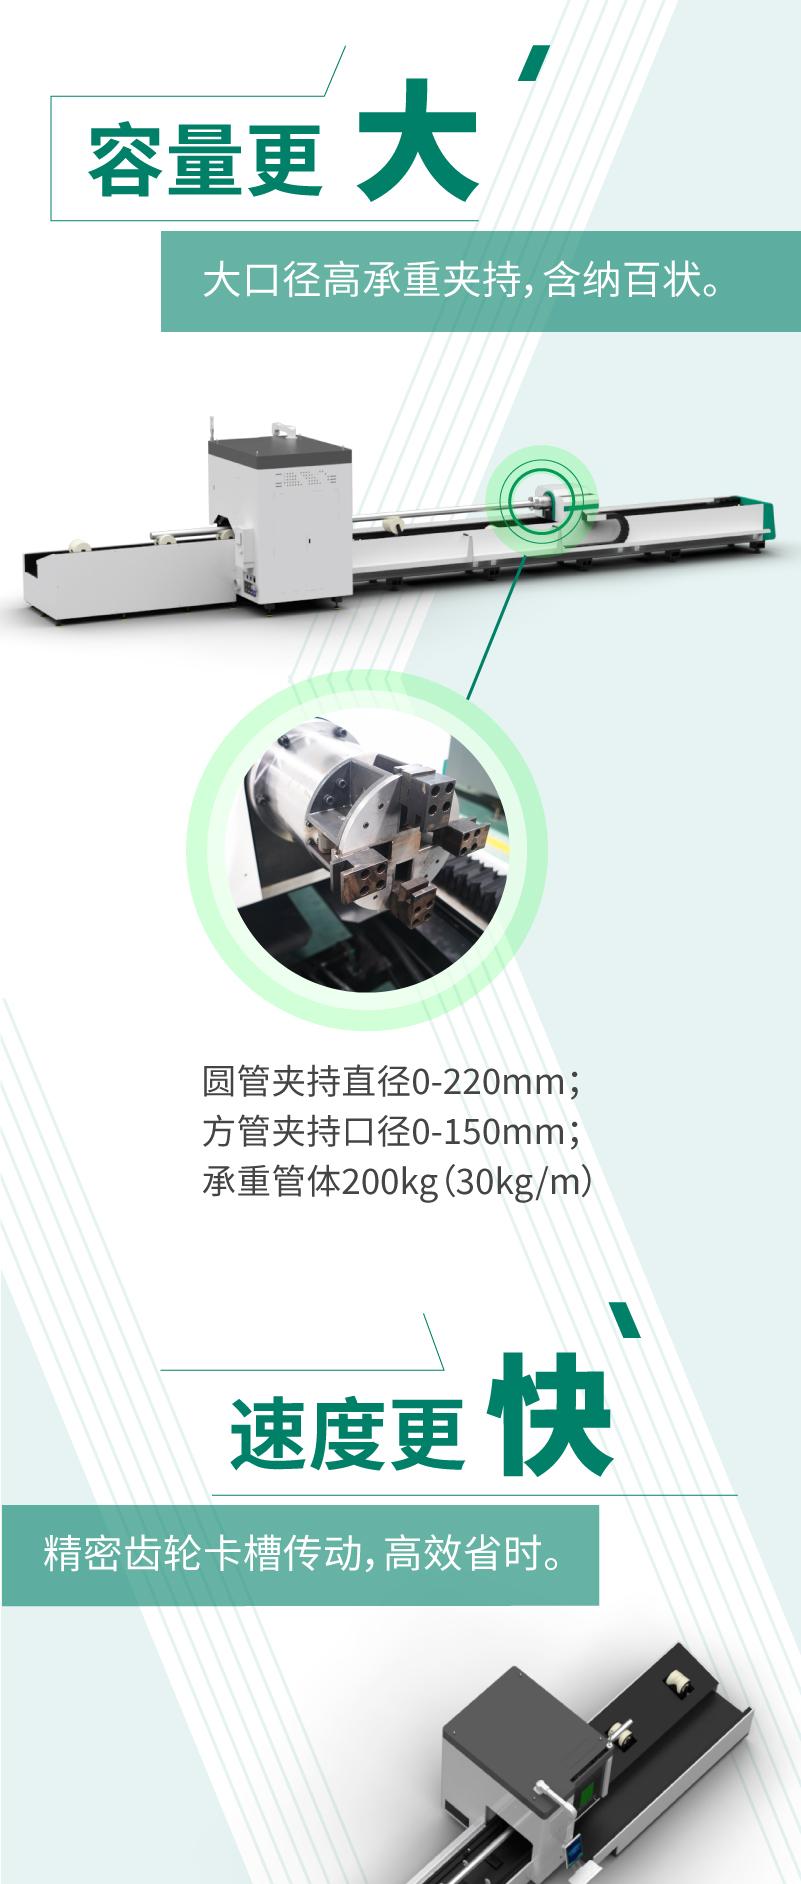 or-t 升级微信公众号-02.jpg